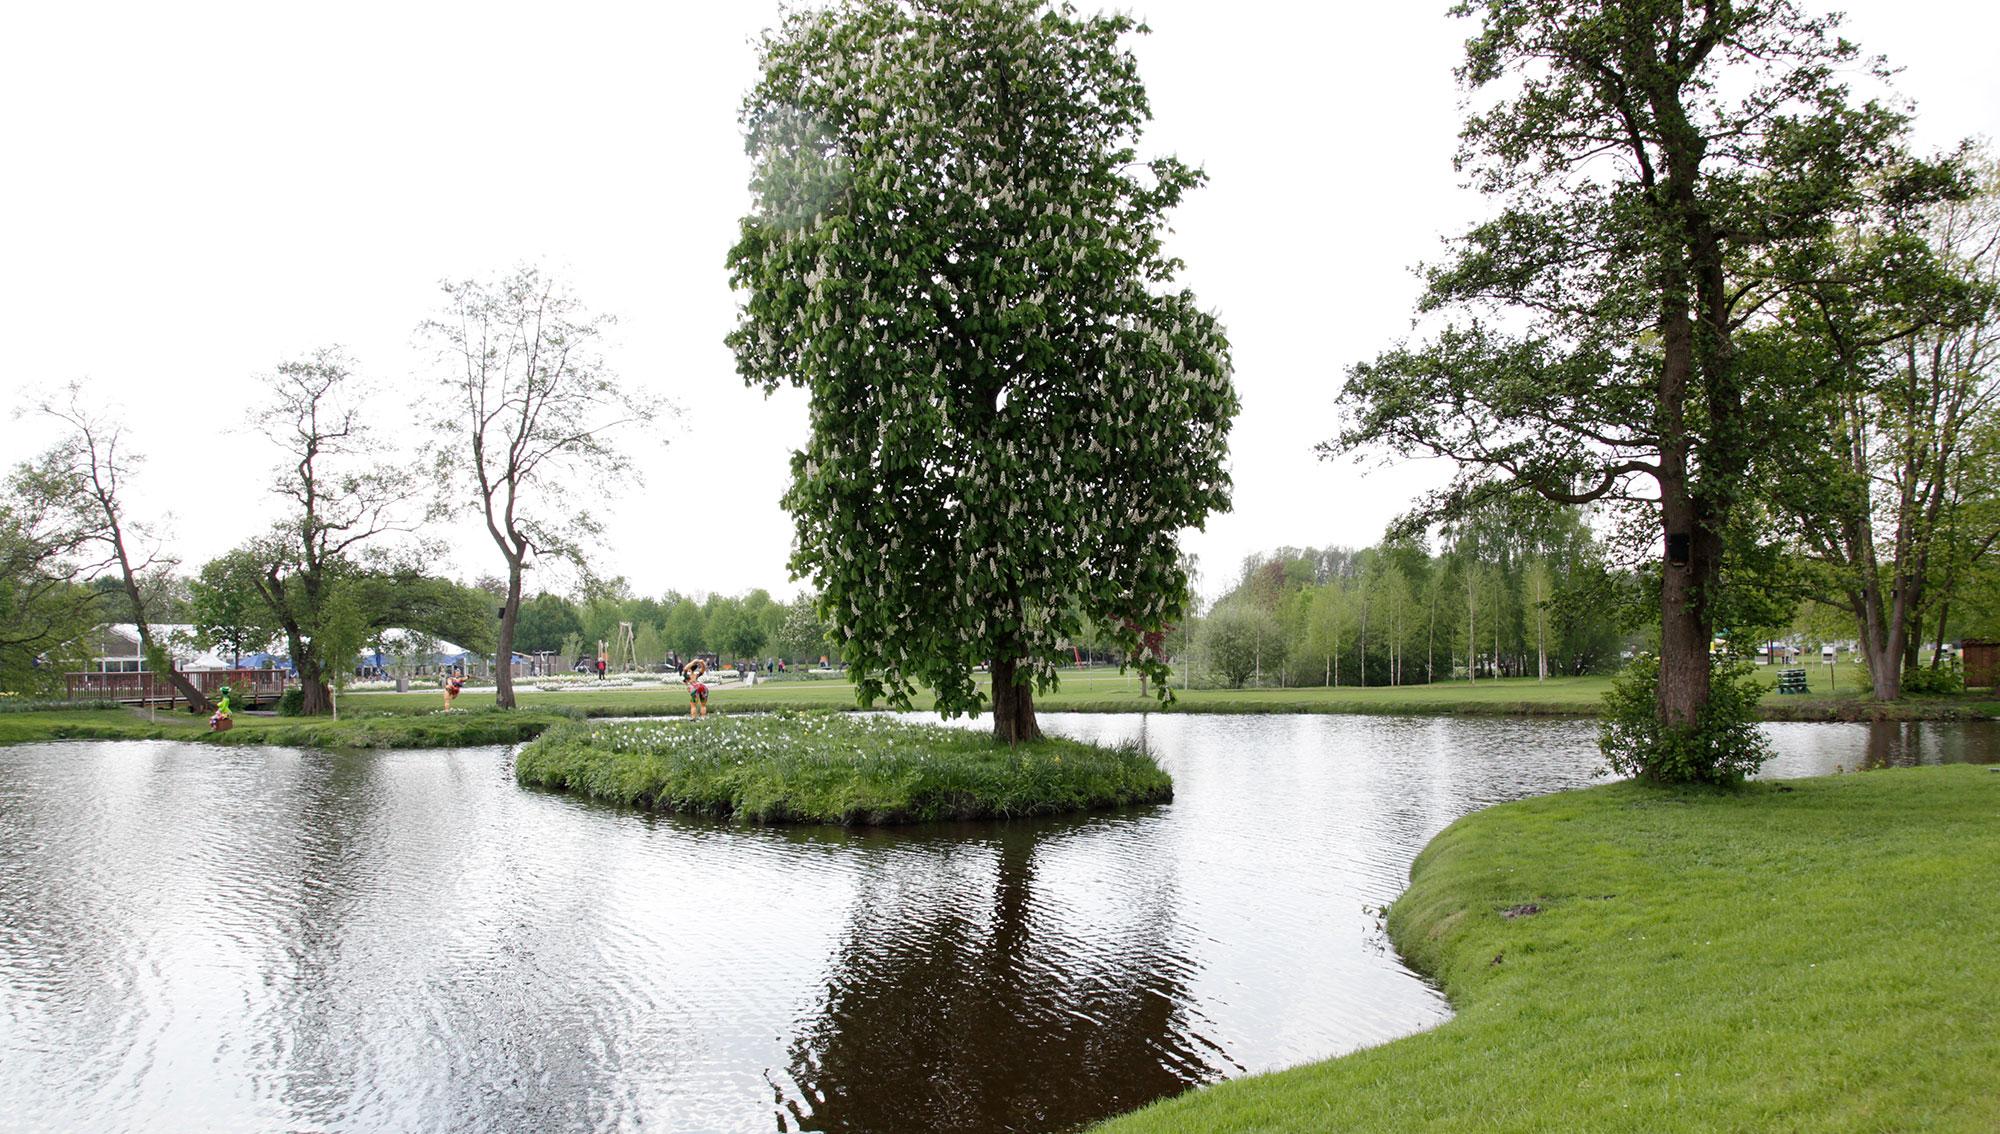 Rmp stephan lenzen landschaftsarchitekten stadtpark papenburg - Rmp landschaftsarchitekten ...